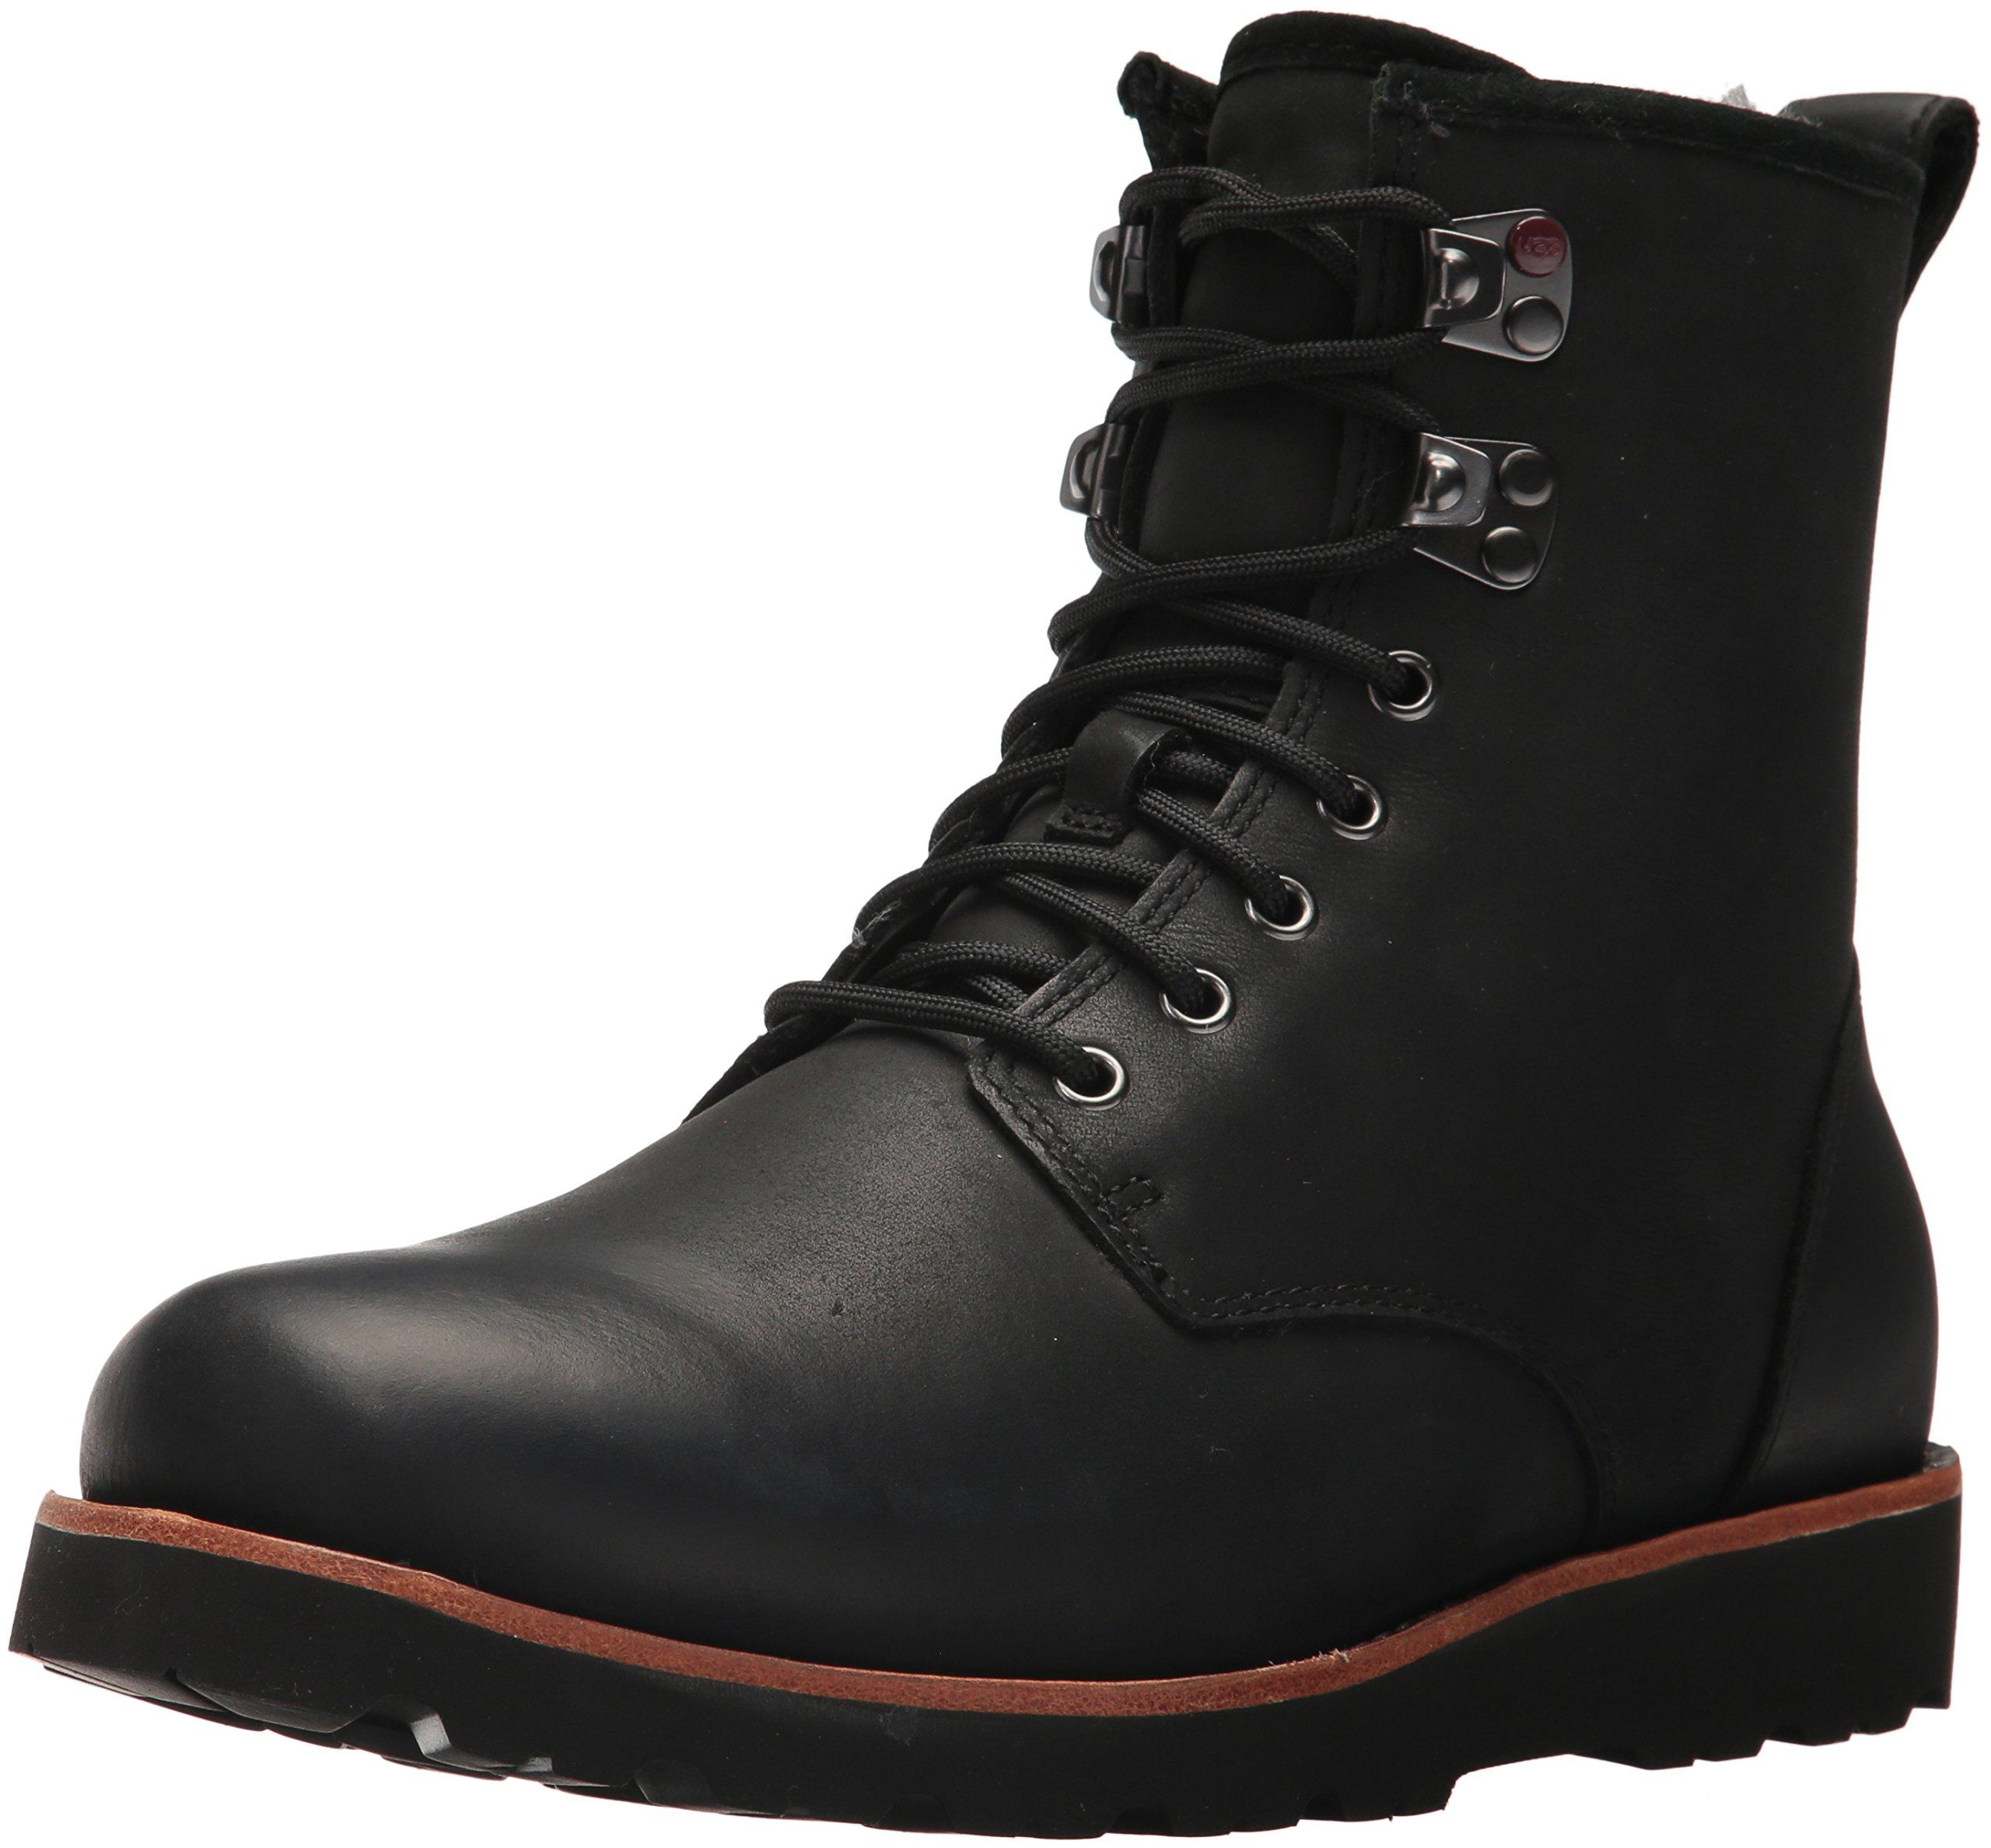 UGG Men's Hannen Tl Winter Boot, Black, 16 M US by UGG